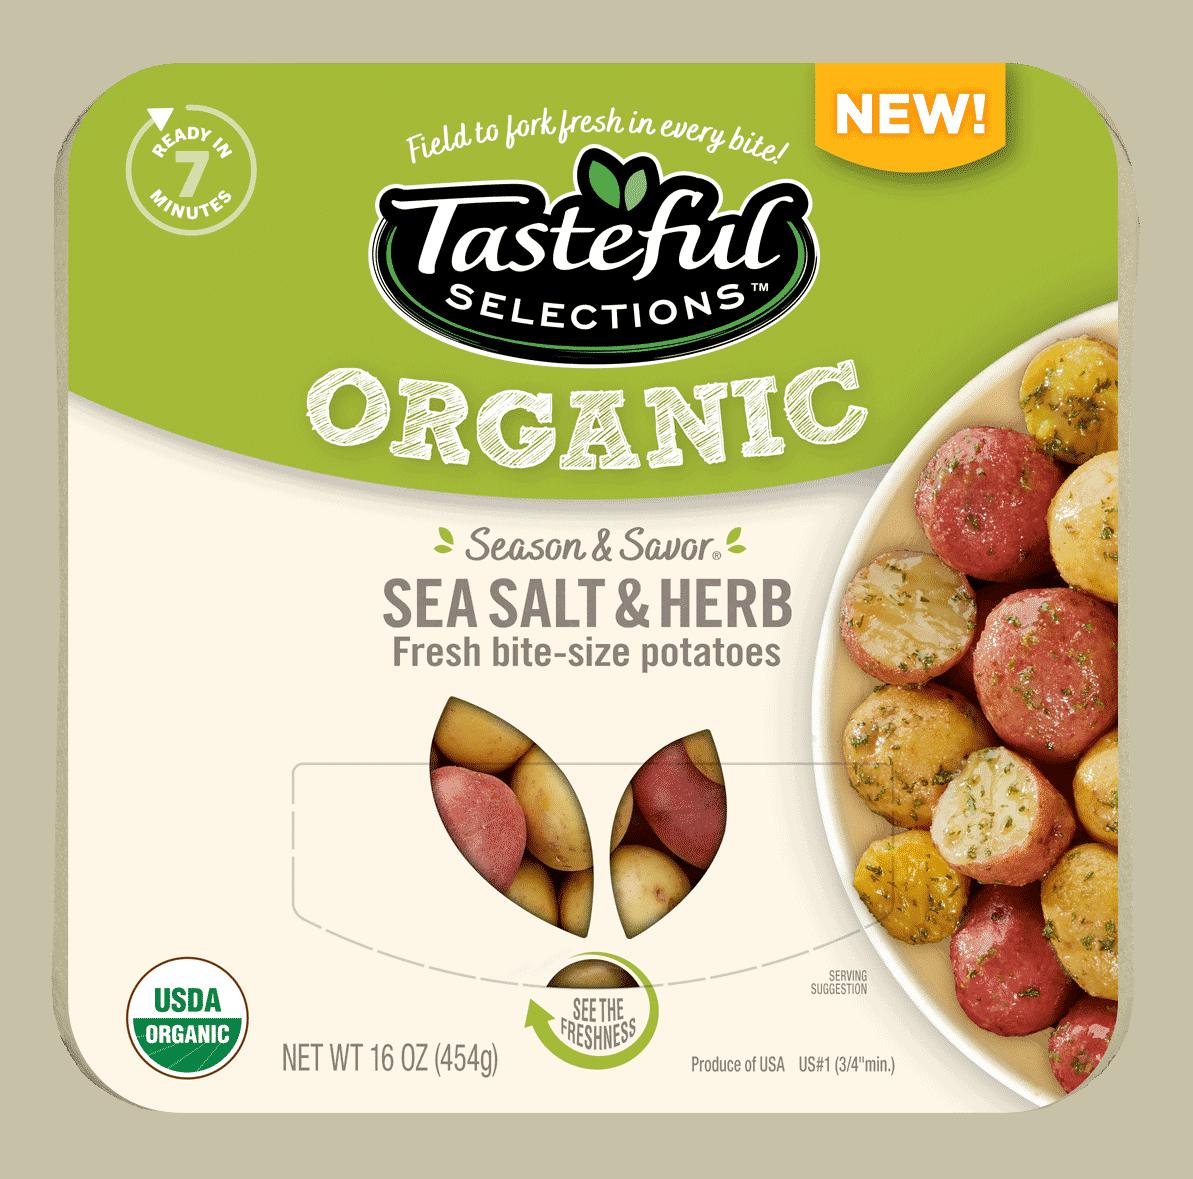 Season Savor Organic Sea Salt & Herb Bite-Size Potatoes